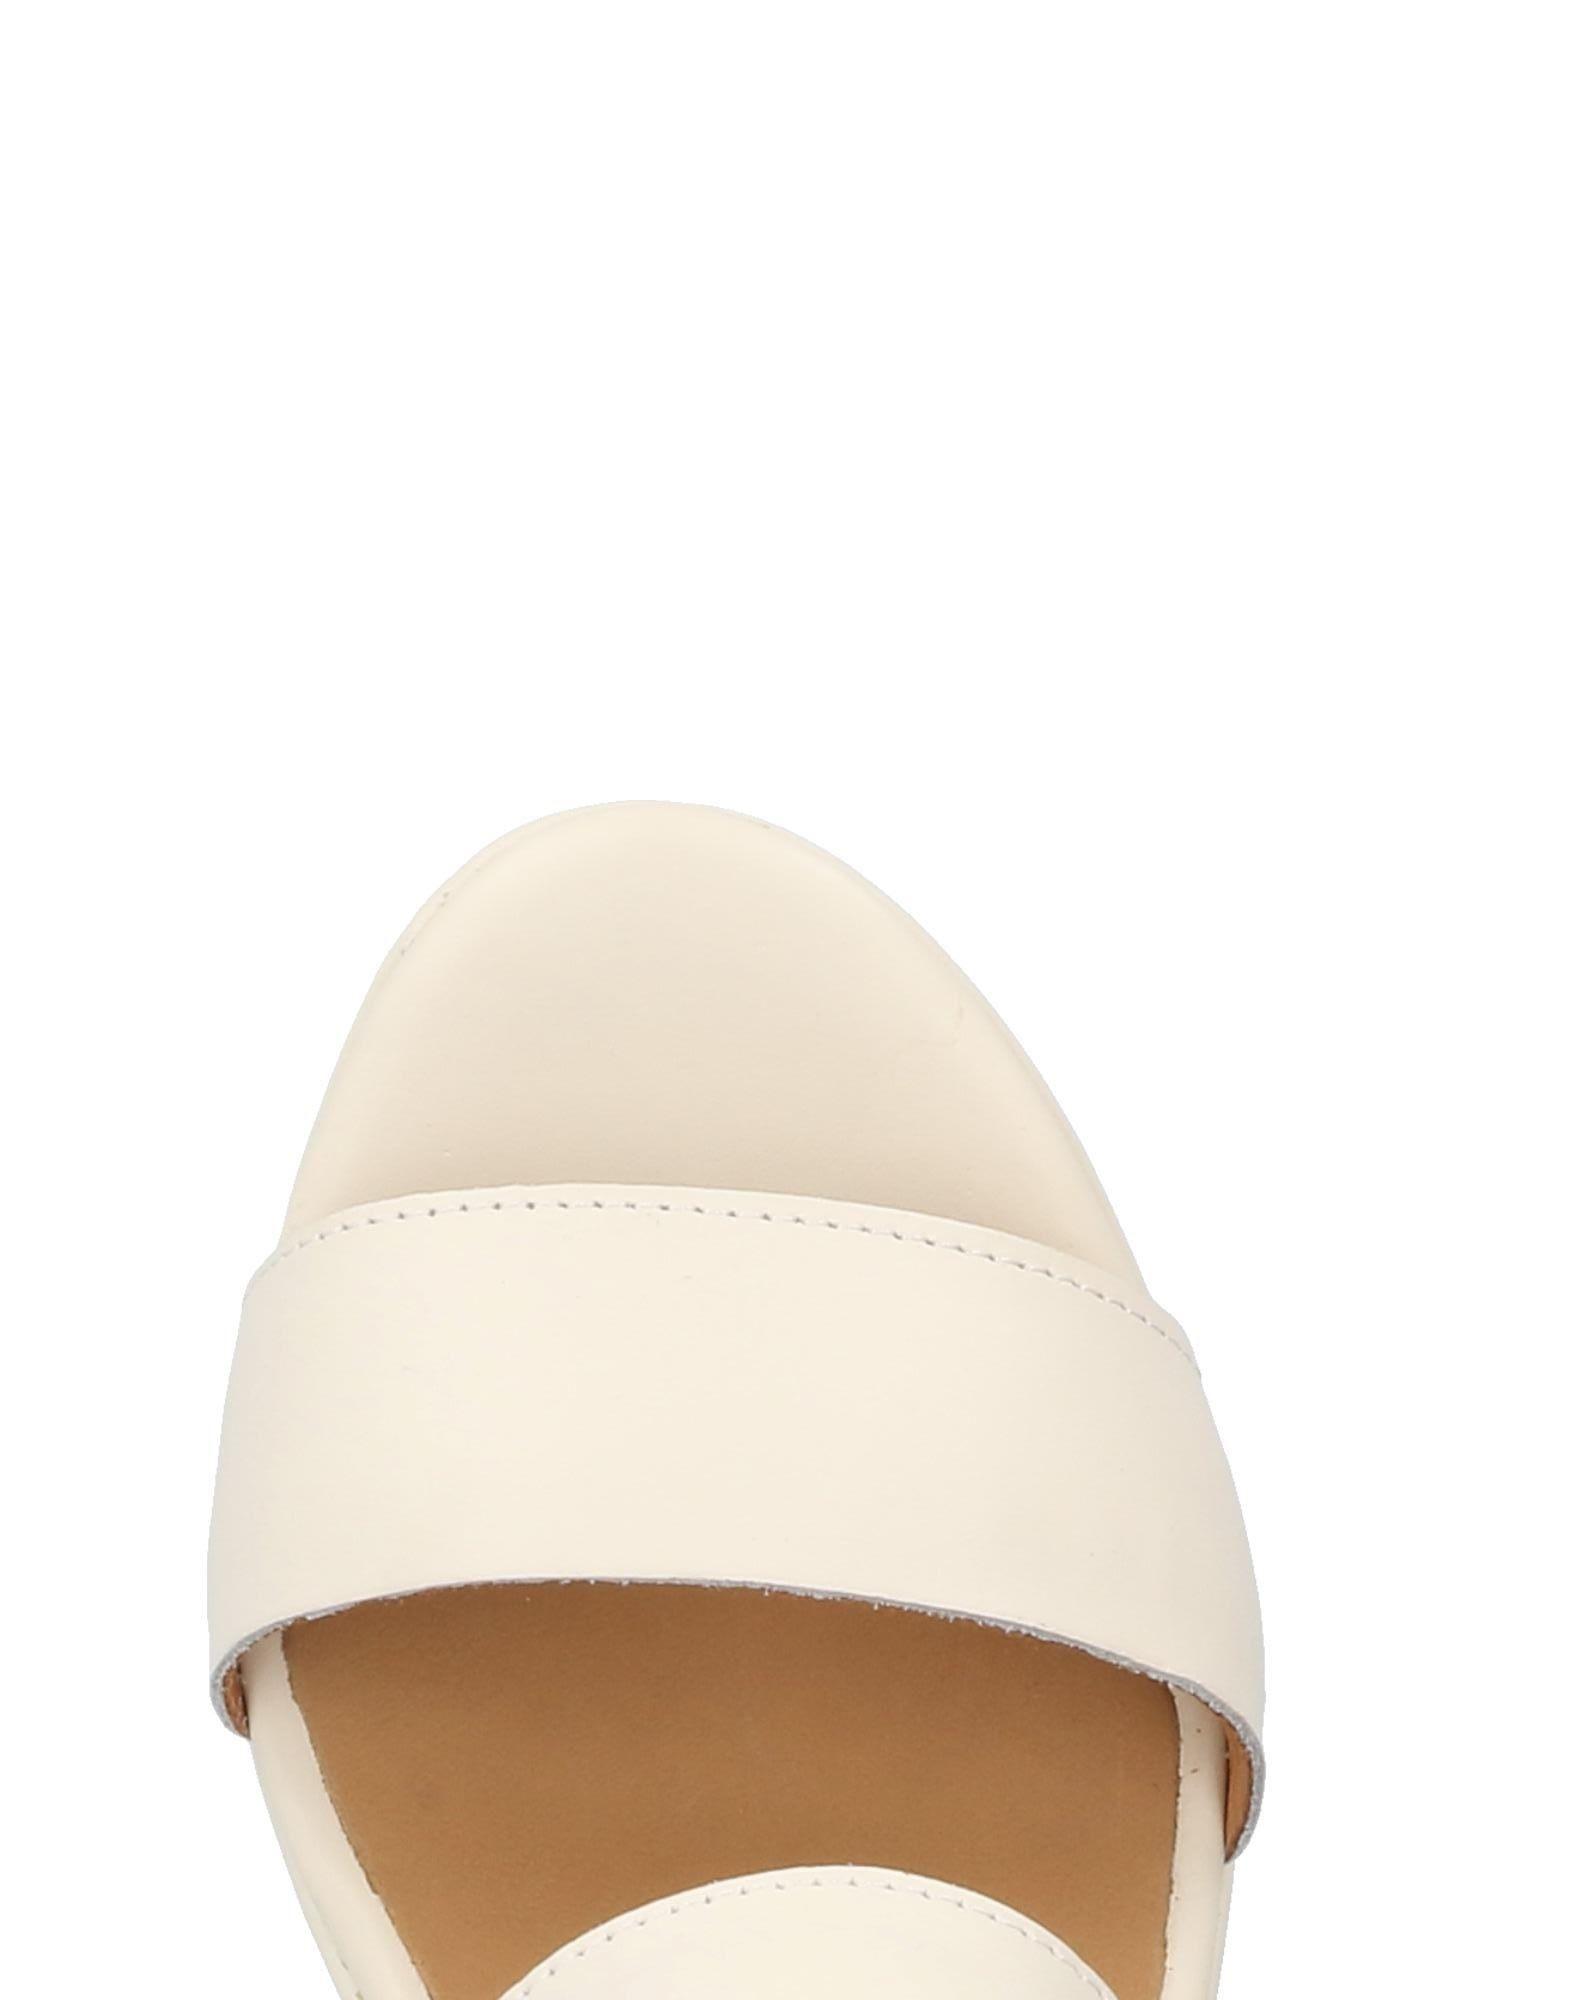 Fiorina Sandalen Gute Damen  11467971OM Gute Sandalen Qualität beliebte Schuhe 925edf